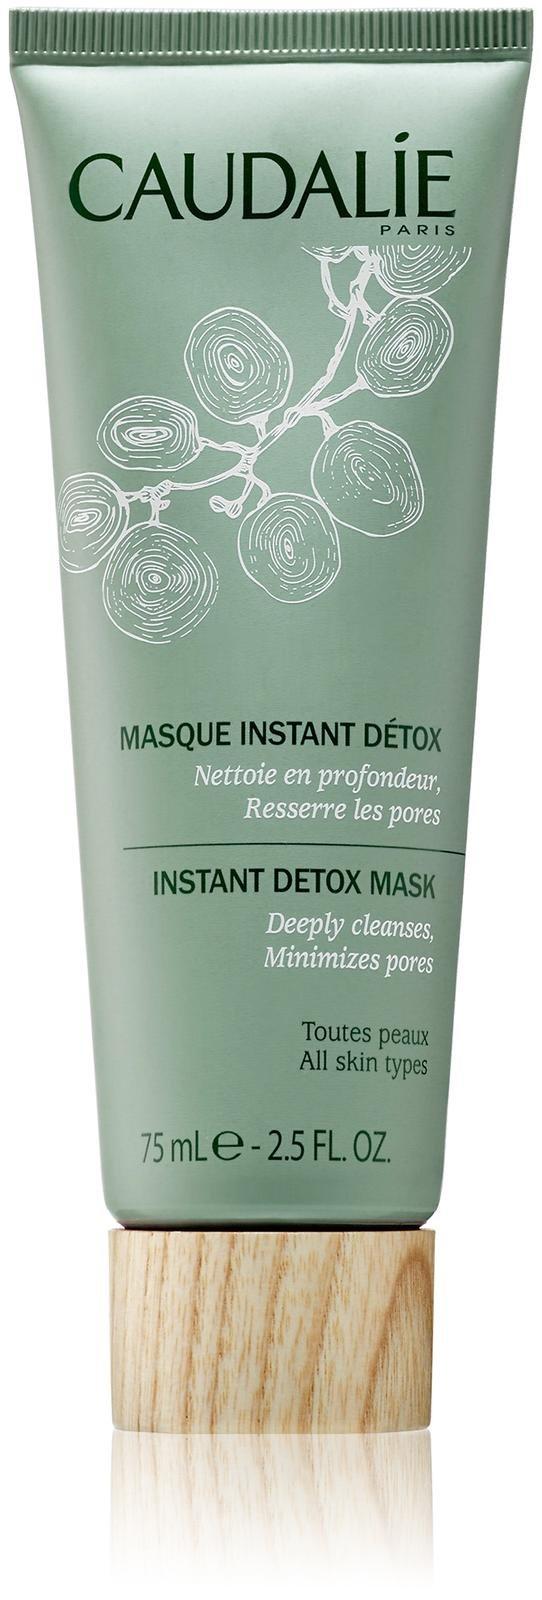 Caudalie Instant Detox Mask 2.5 oz